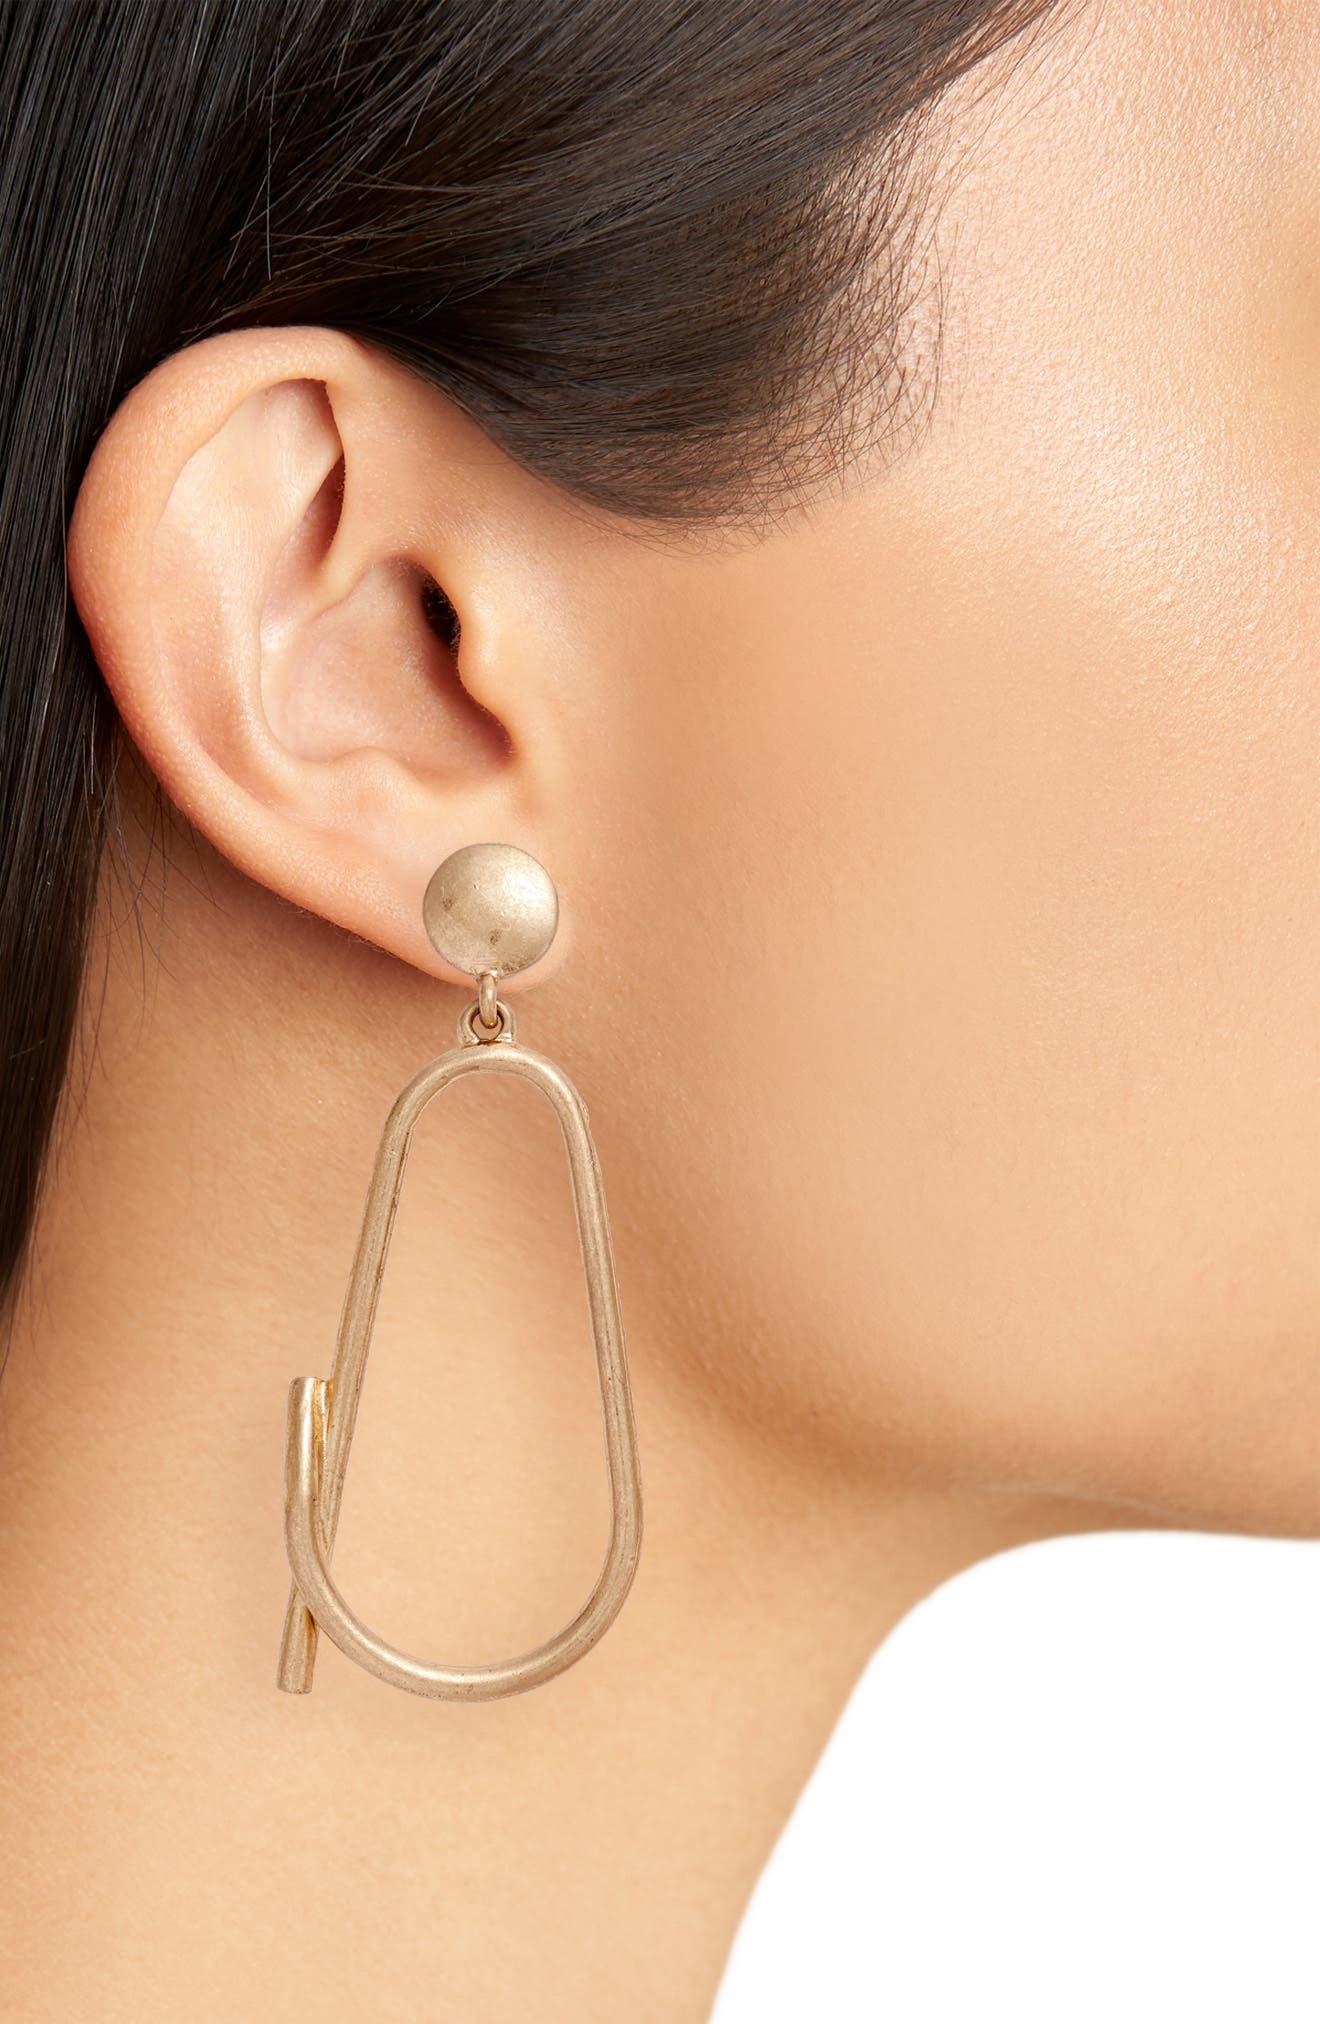 Sculptural Loop Drop Earrings,                             Alternate thumbnail 2, color,                             710